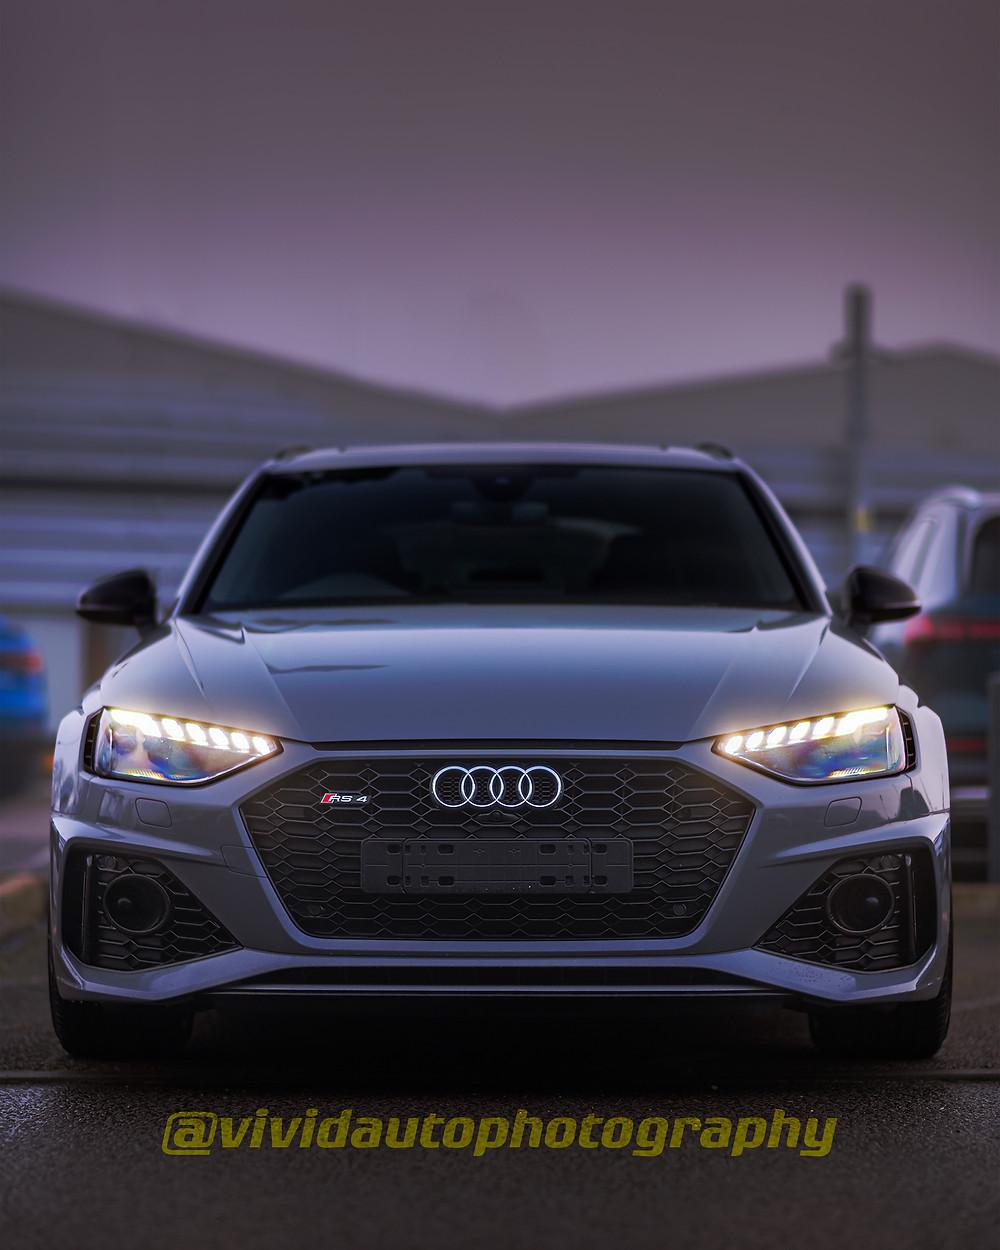 Audi RS4 Avant | Front face poster